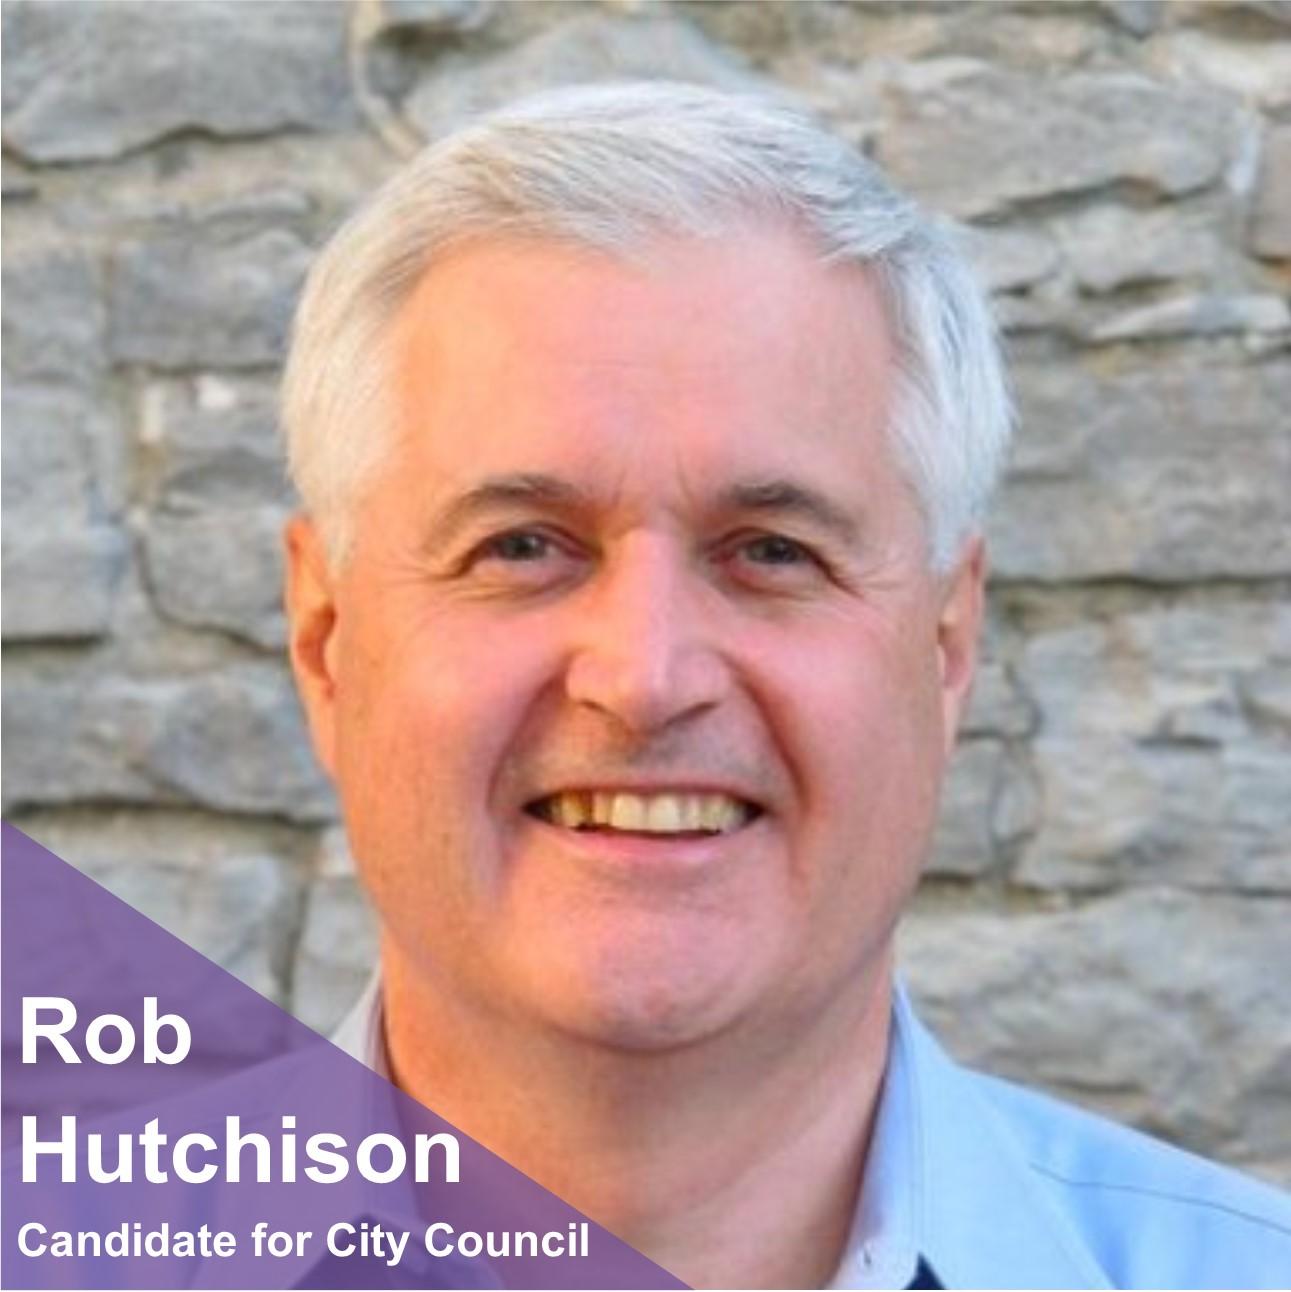 RobHutchisonW.jpg